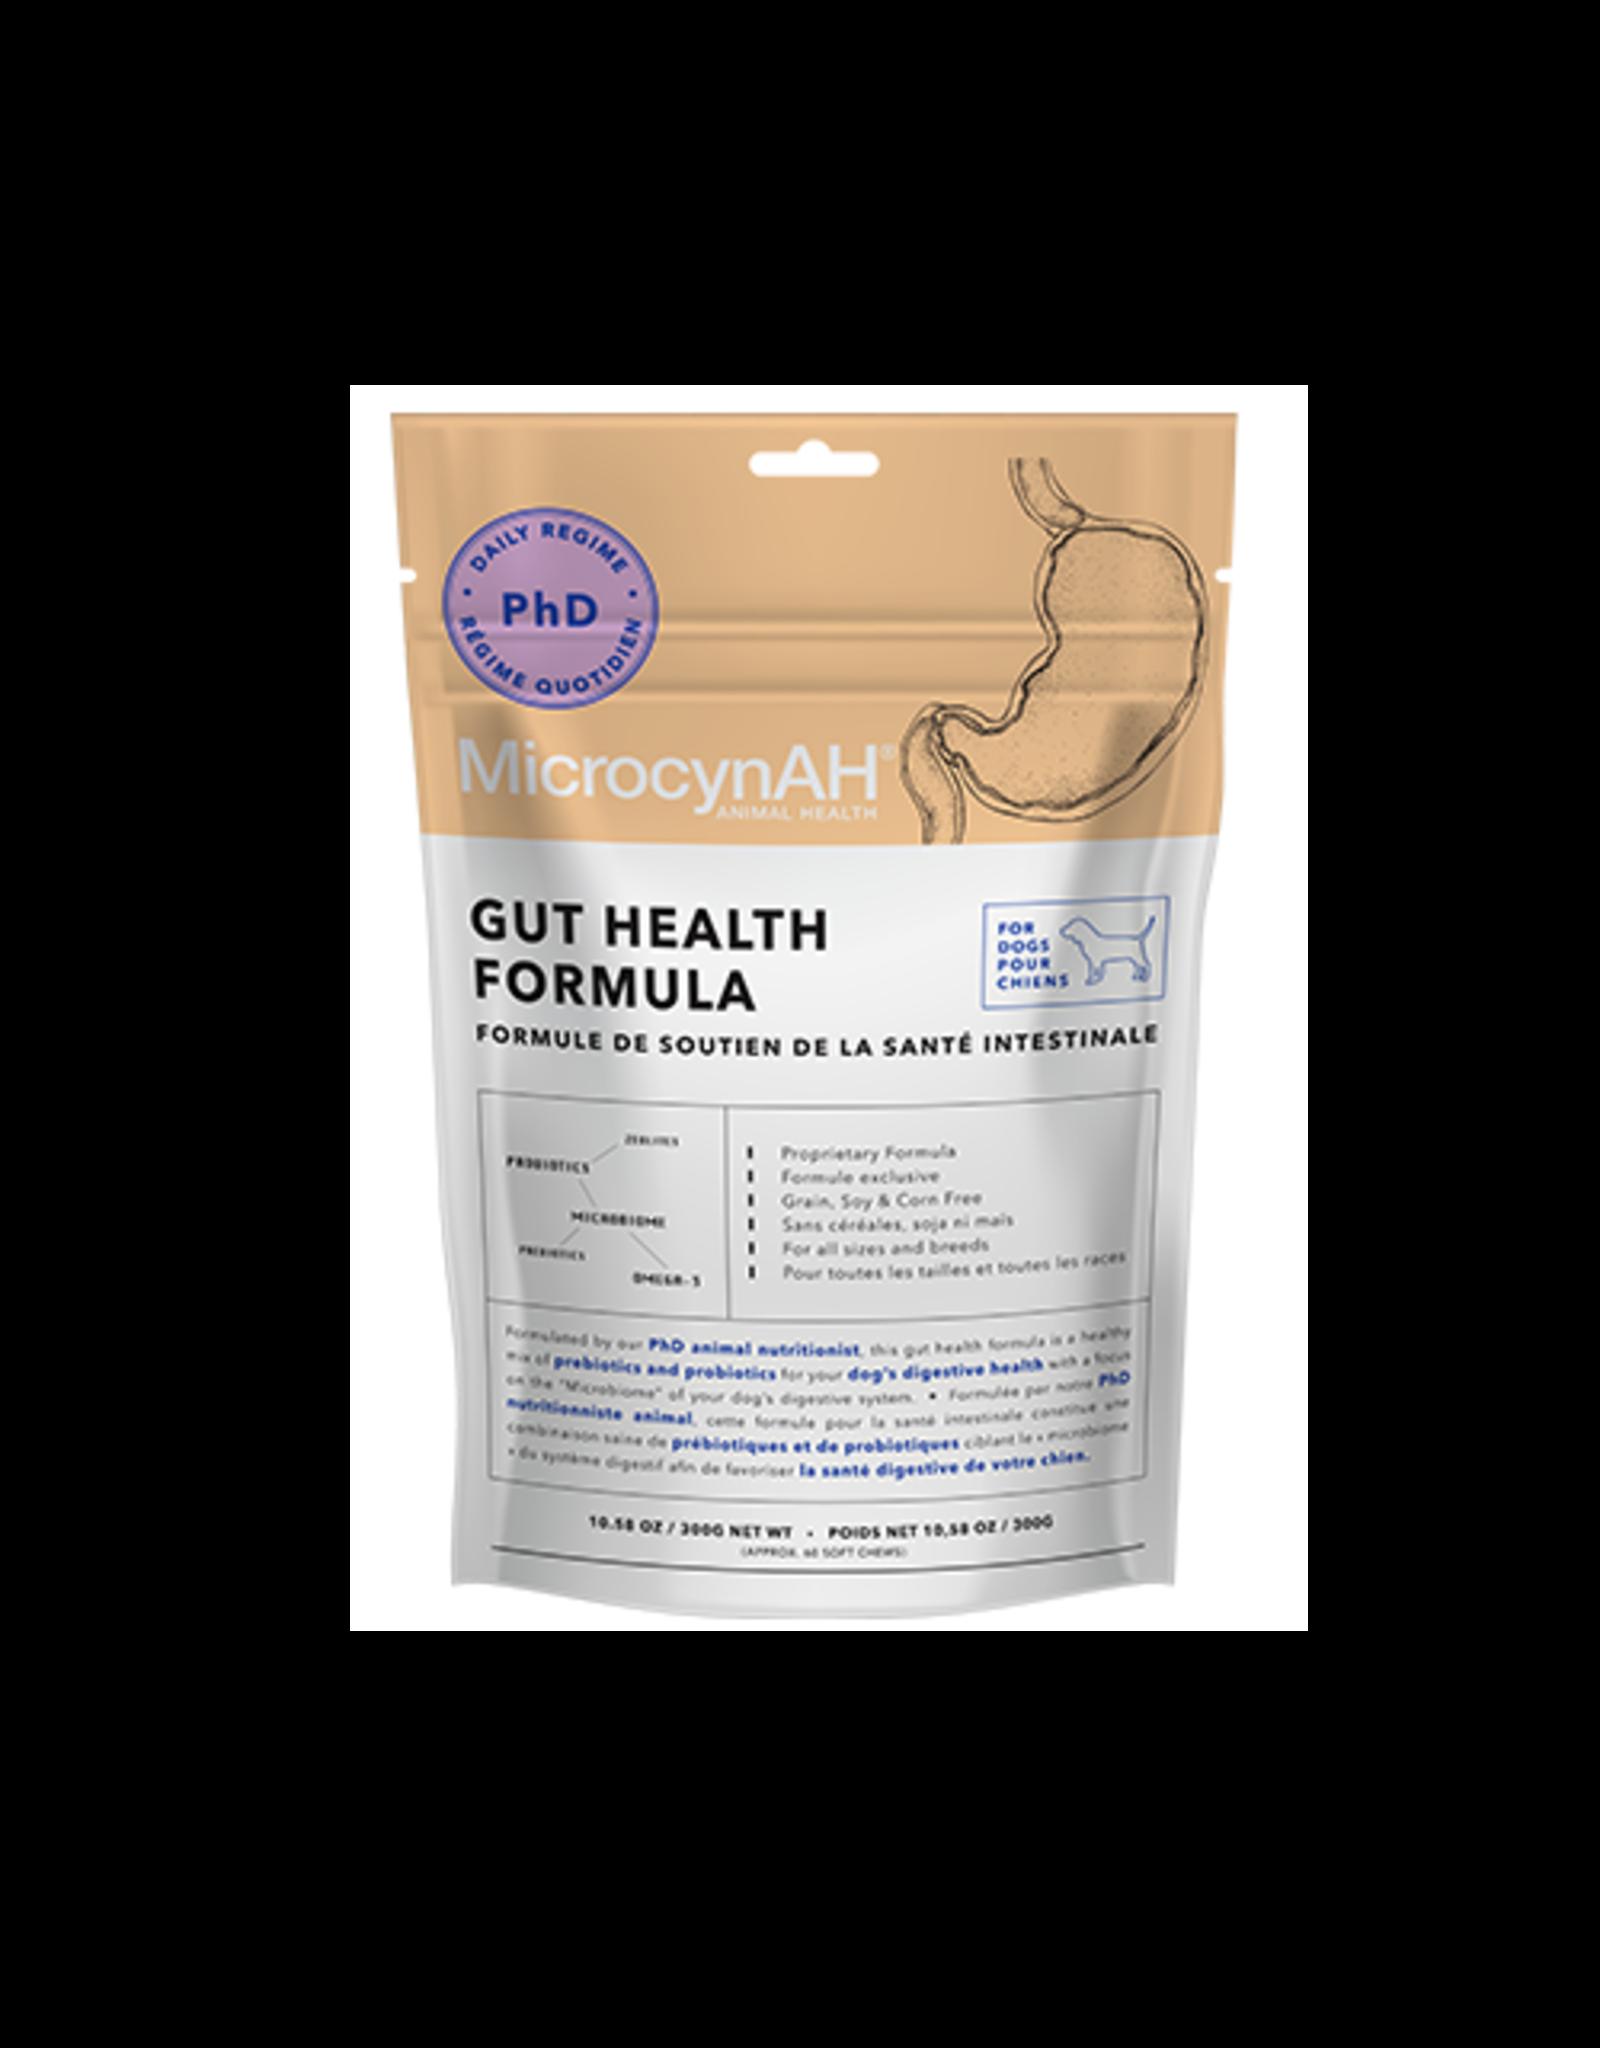 MicrocynAH MicrocynAH Gut Health Formula for Dogs 4.2 oz